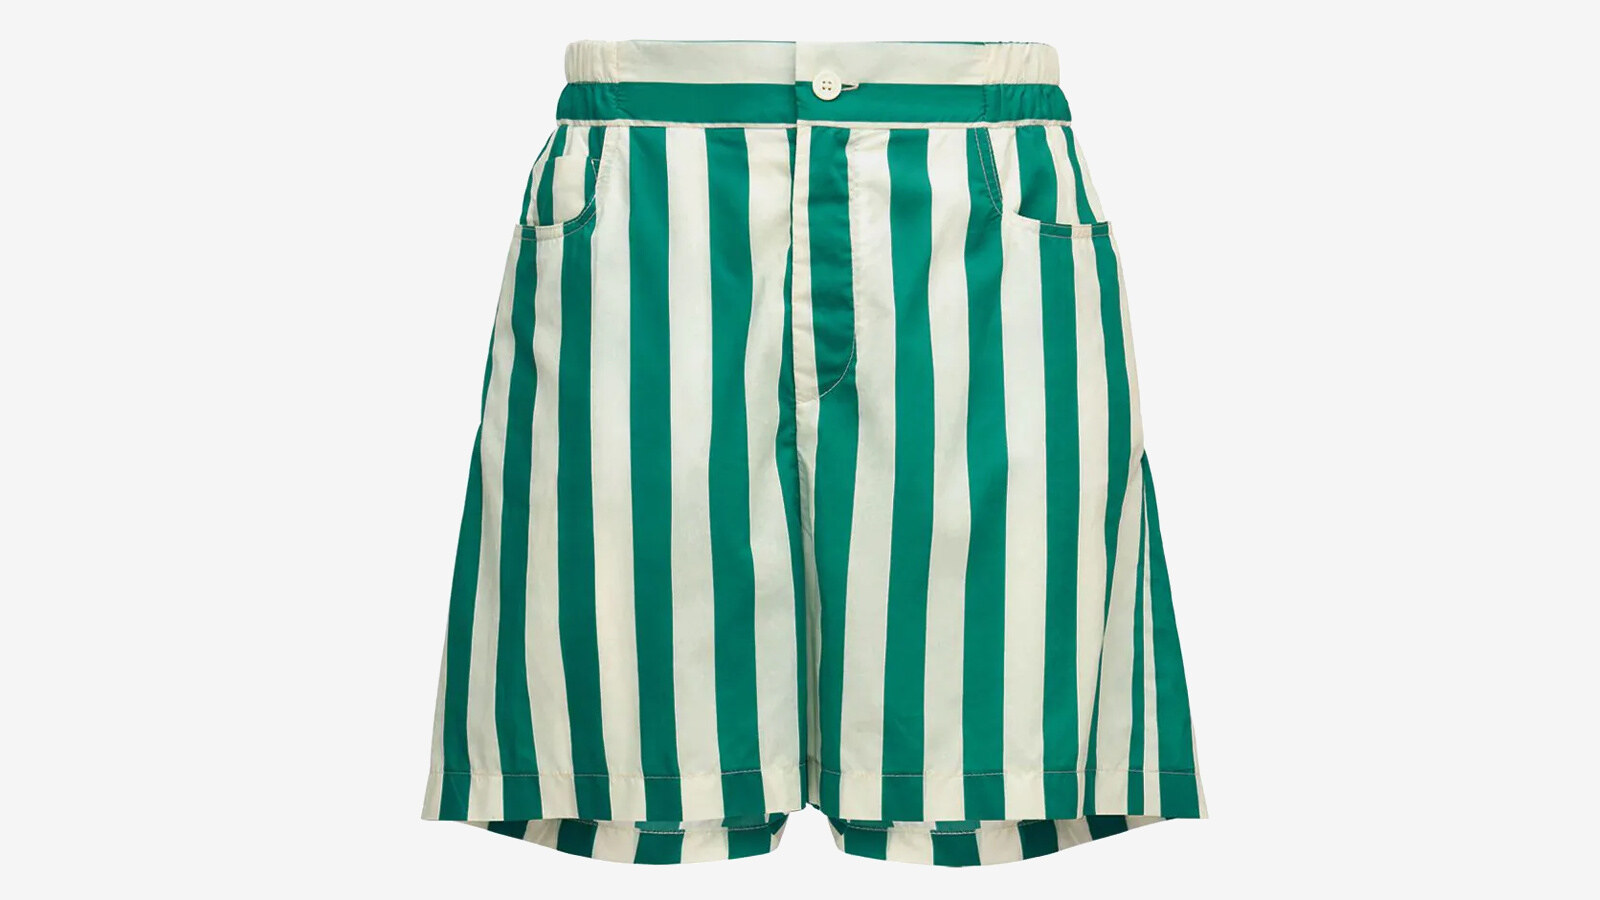 Sunnei - off white & mint striped shorts